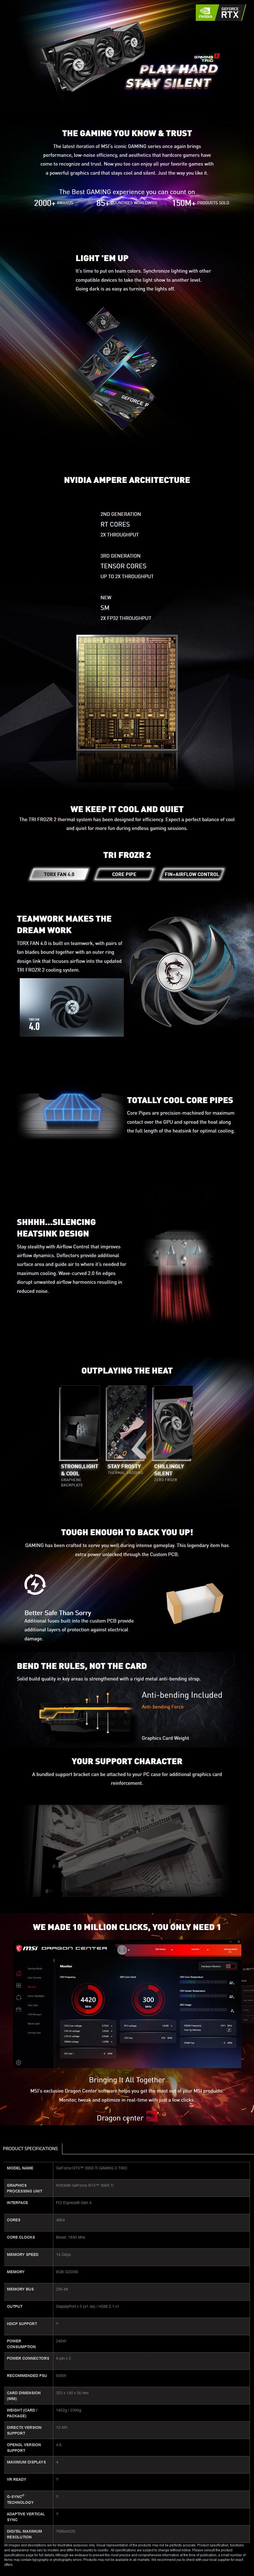 MSI GeForce RTX 3060 Ti GAMING X TRIO 8GB Video Card - Overview 1